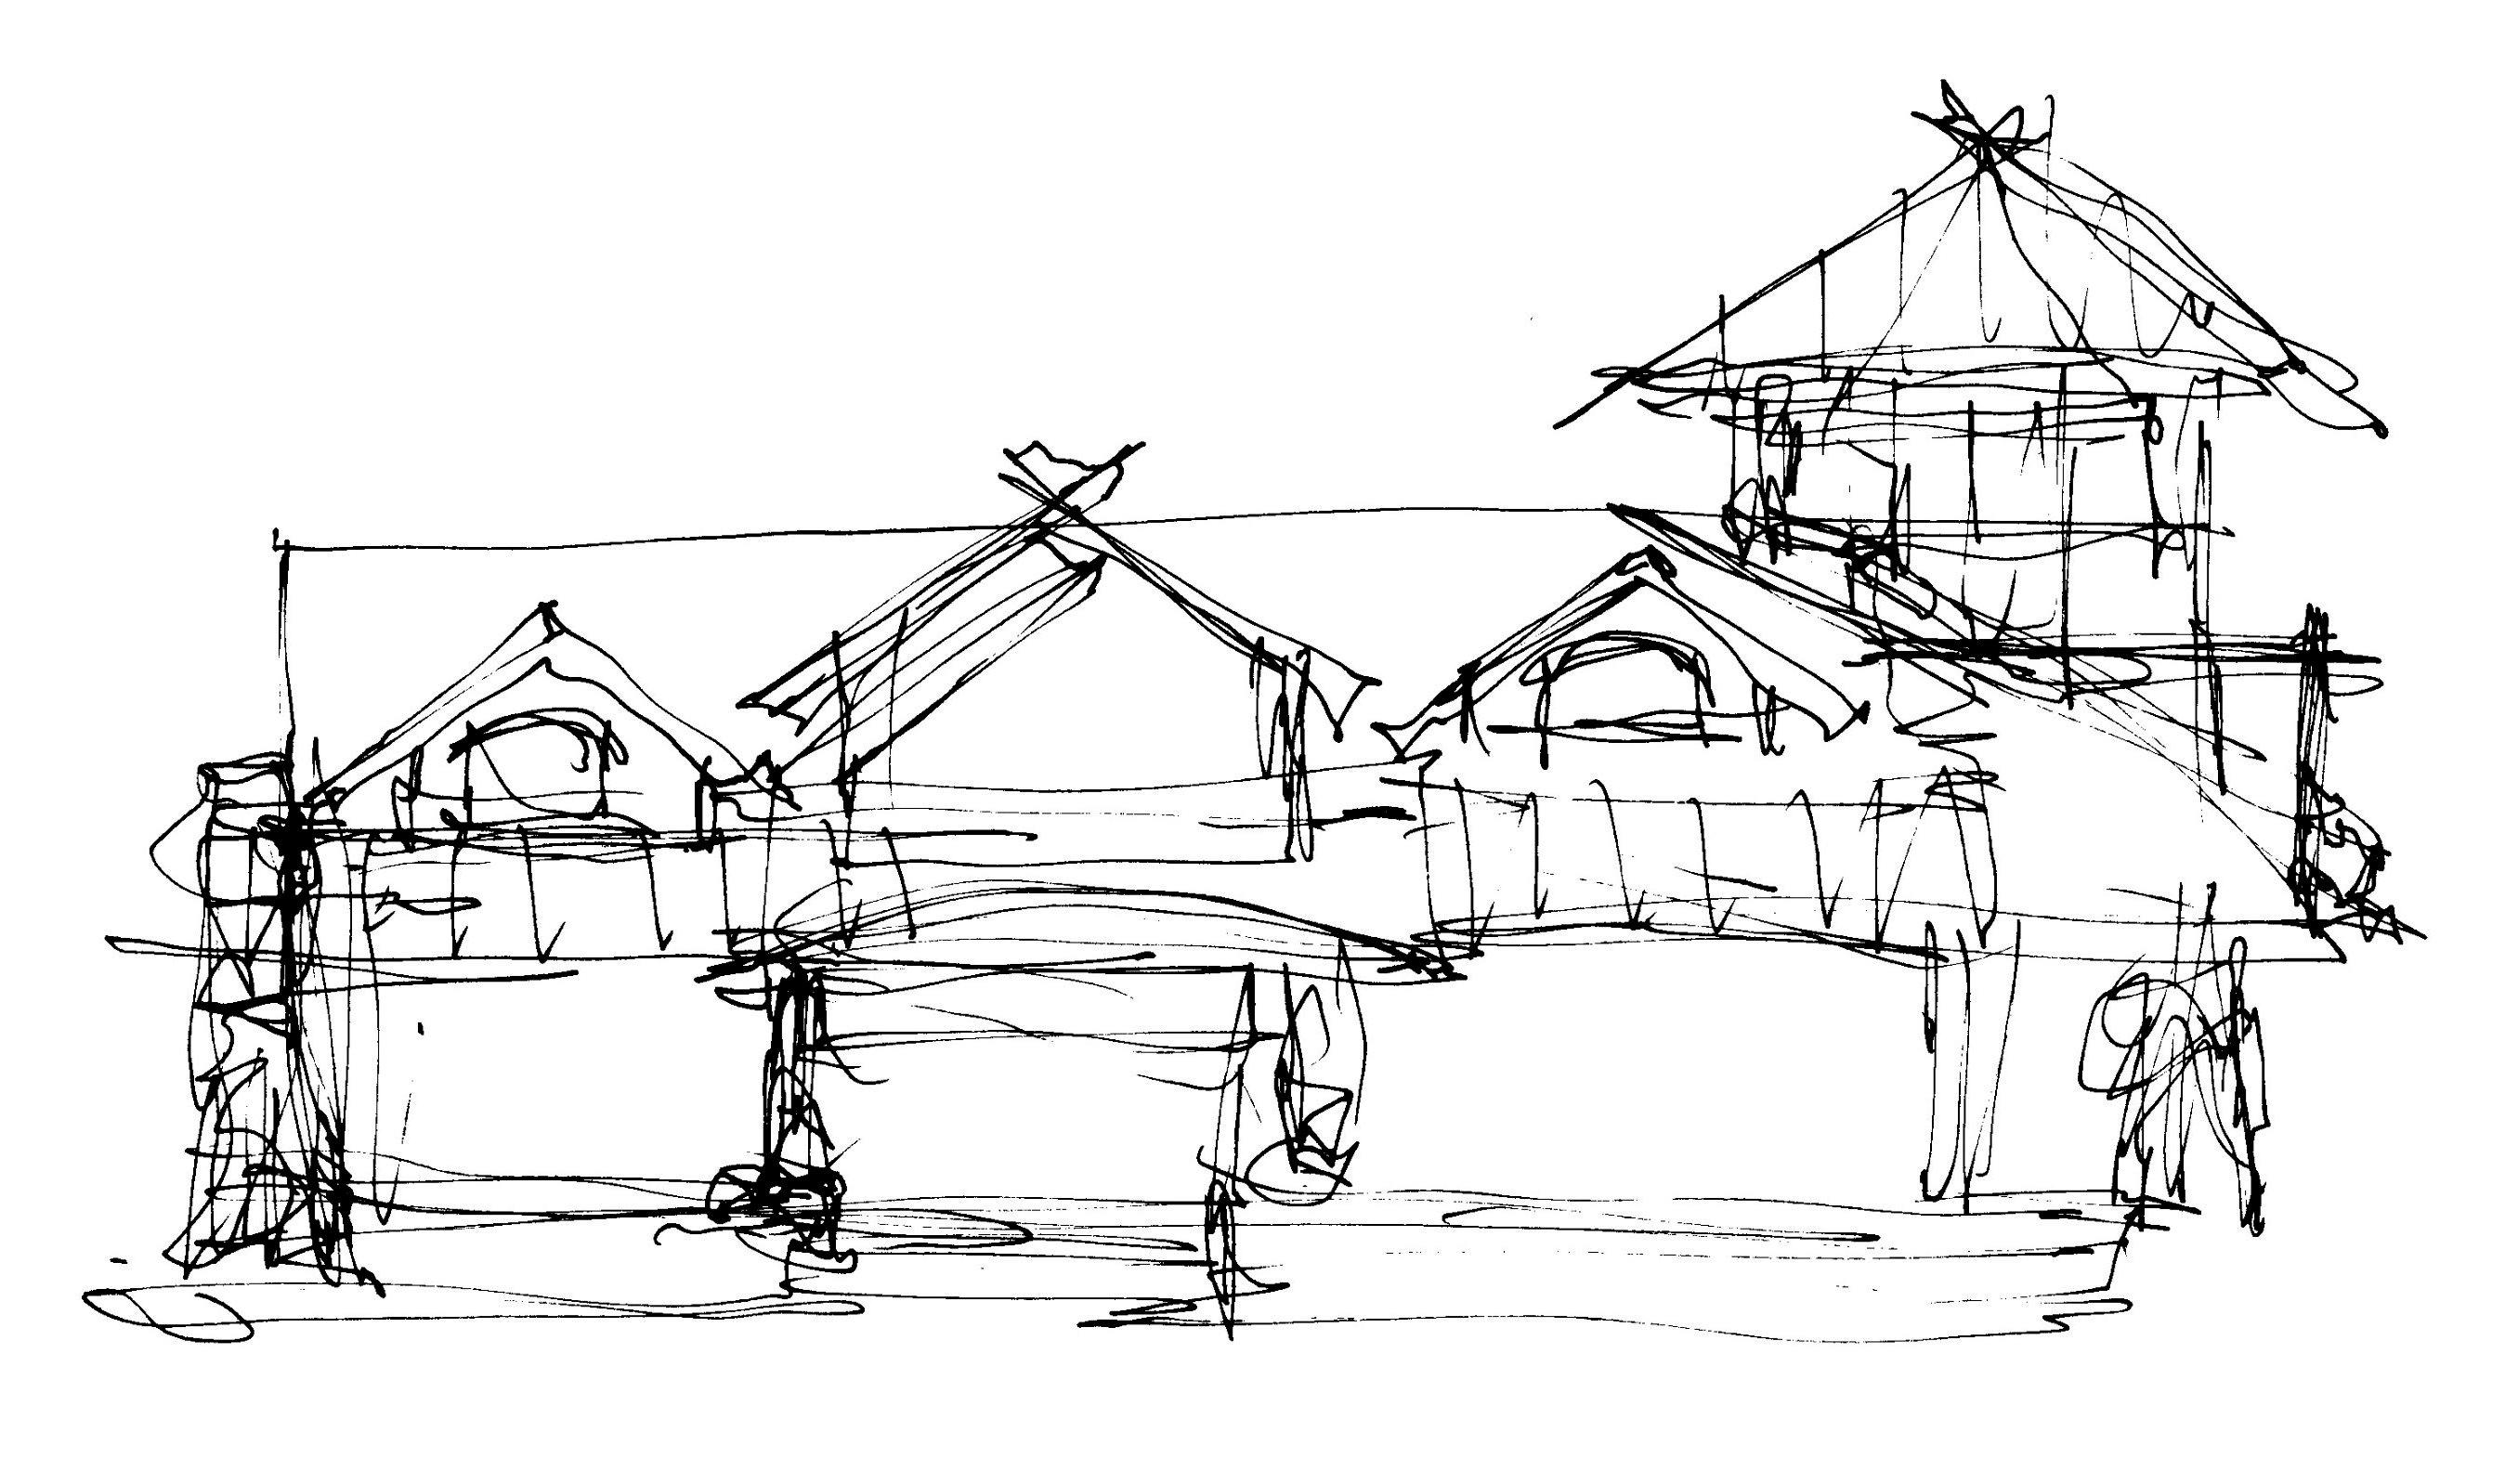 Architects Mountain Architects Hendricks Architecture Idaho